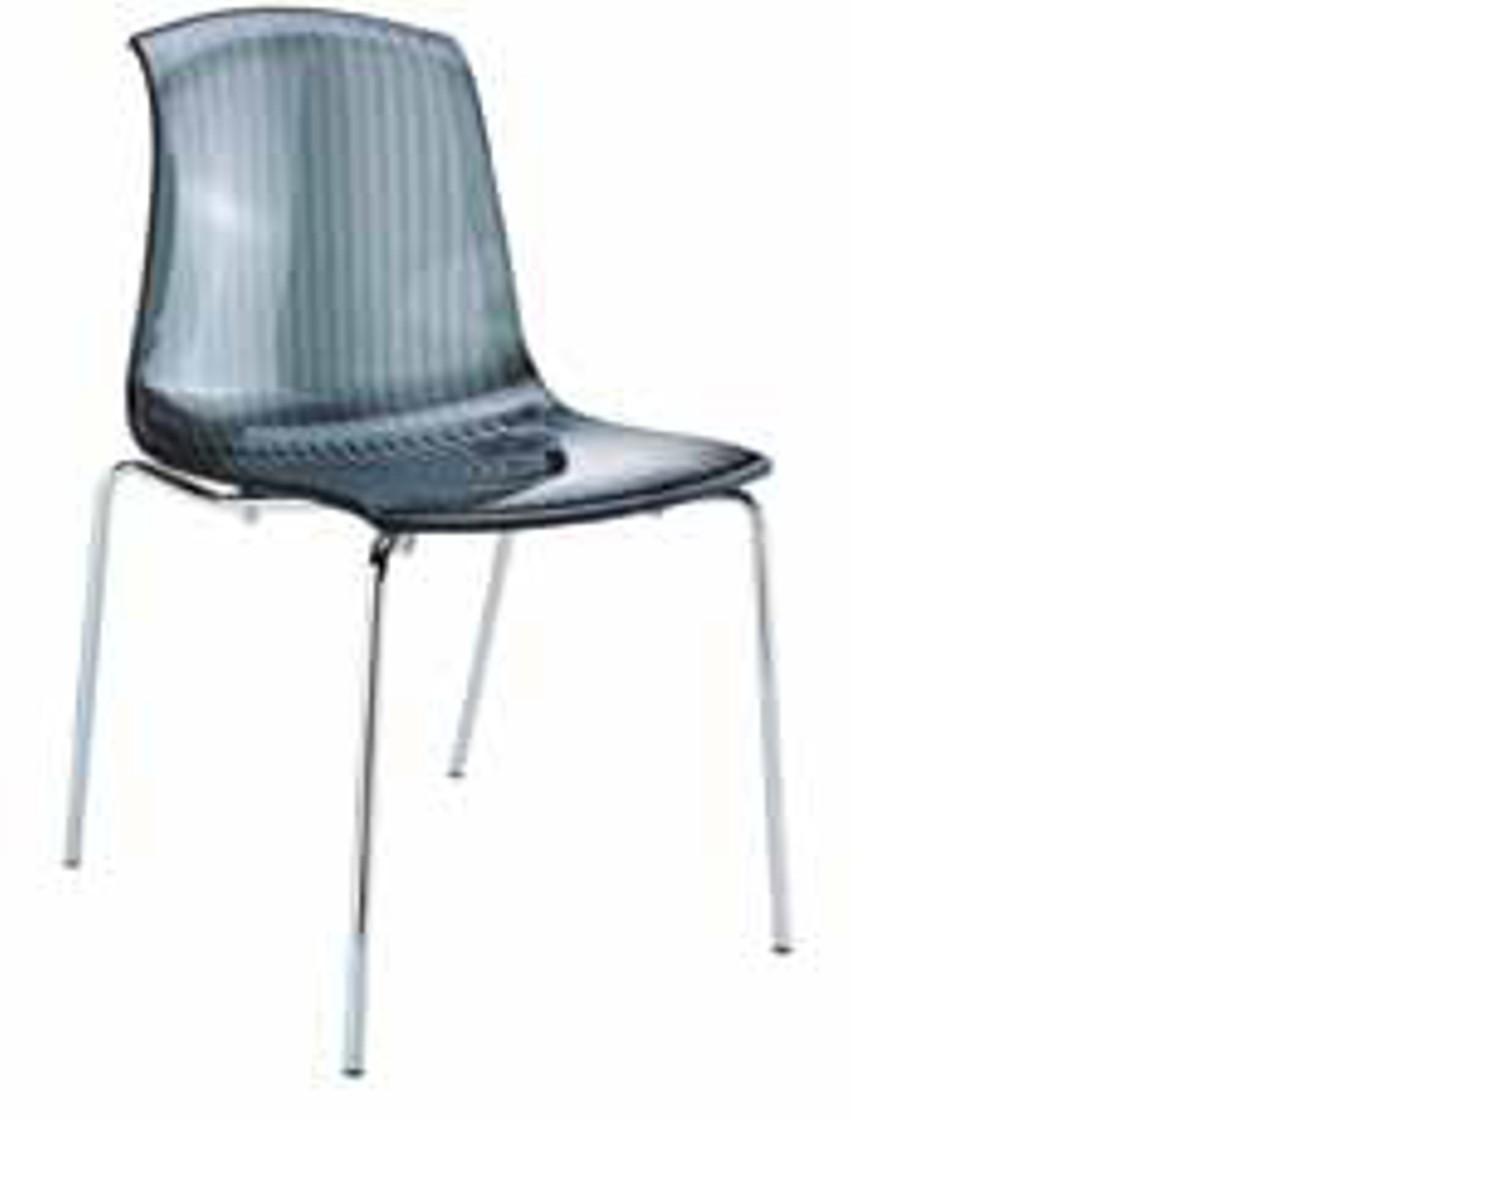 stuhl aus polycarbonat. Black Bedroom Furniture Sets. Home Design Ideas